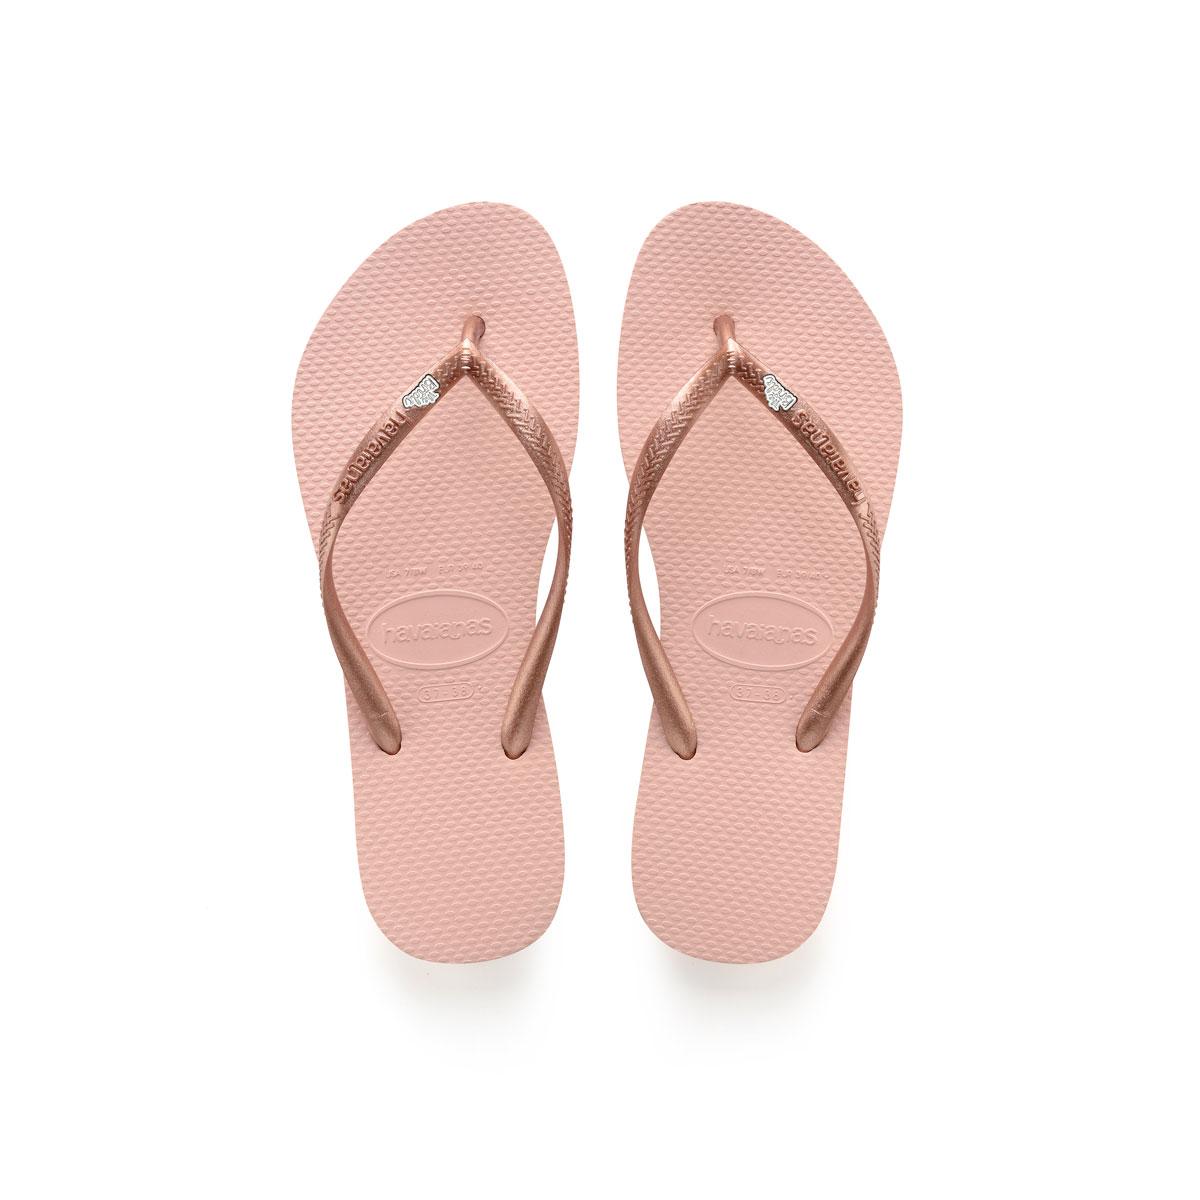 Havaianas Slim Ballet Rose Flip-Flops with 'The Bride' Charm Wedding